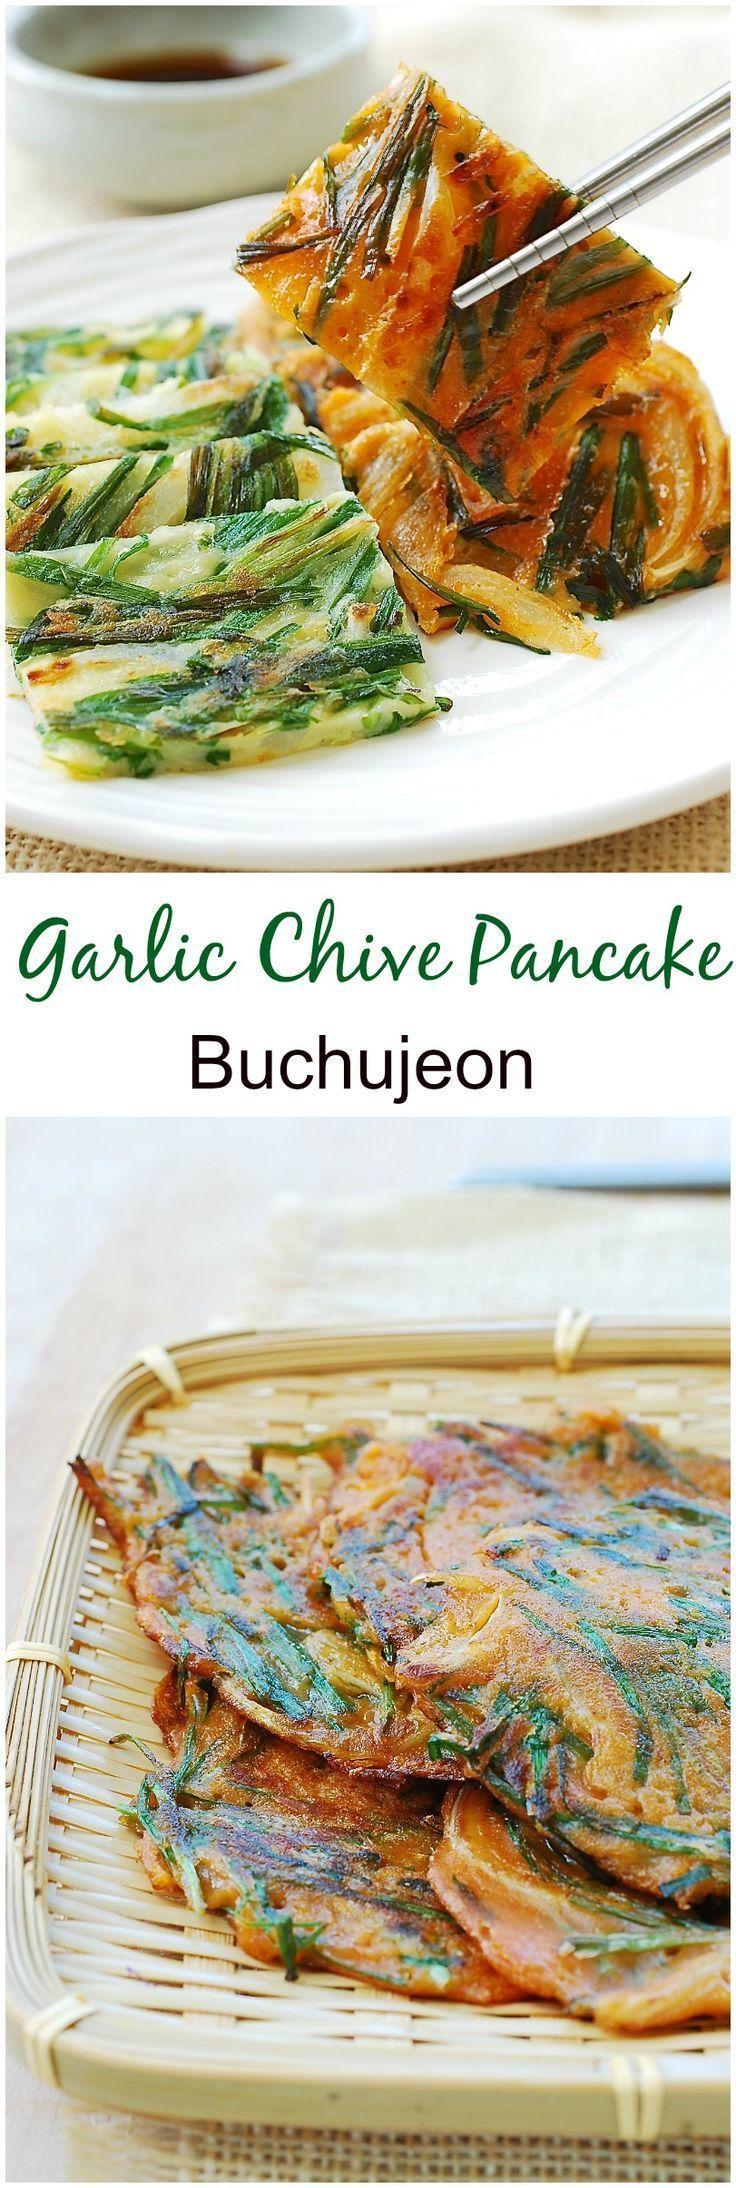 Buchujeon (Korean Pancakes Made with Garlic Chives)